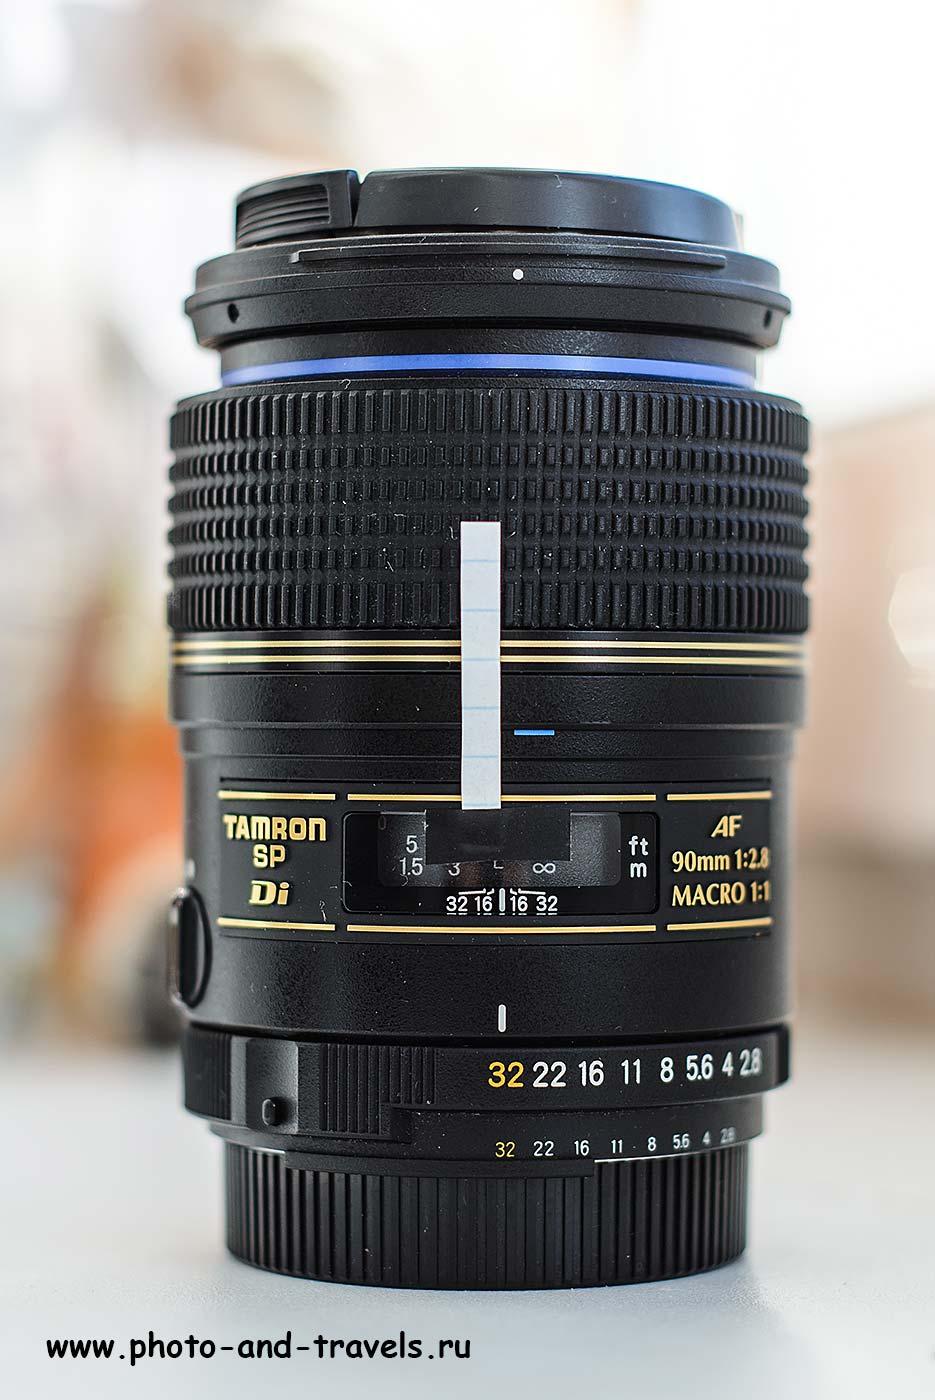 Фото 19. Обозначение точек фокусировки для съемки в режиме стекинга по фокусу. Использование объектива Tamron 90mm f/2.8.